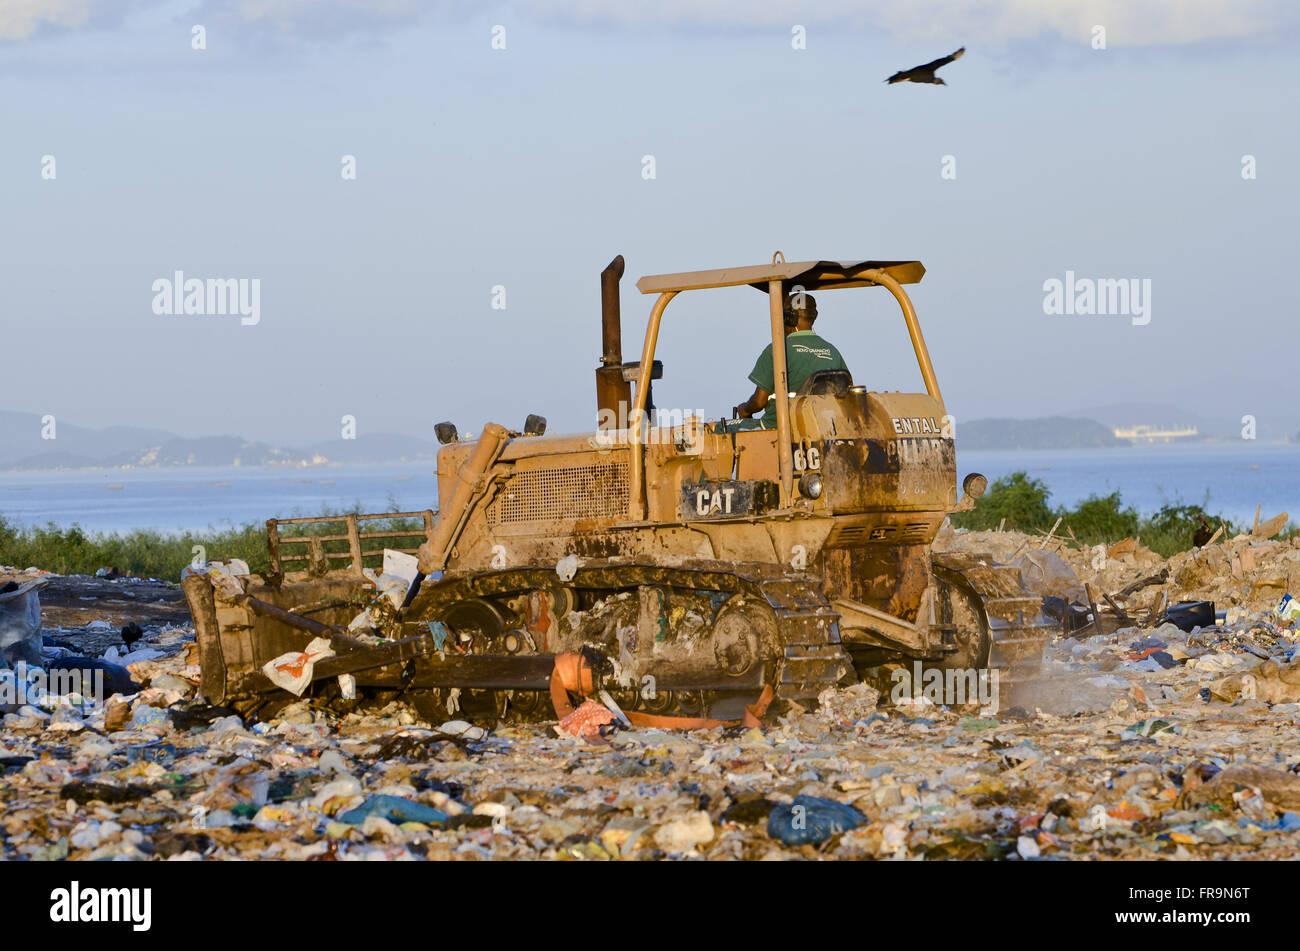 Bulldozer operator in Jardim Gramacho Landfill - Stock Image